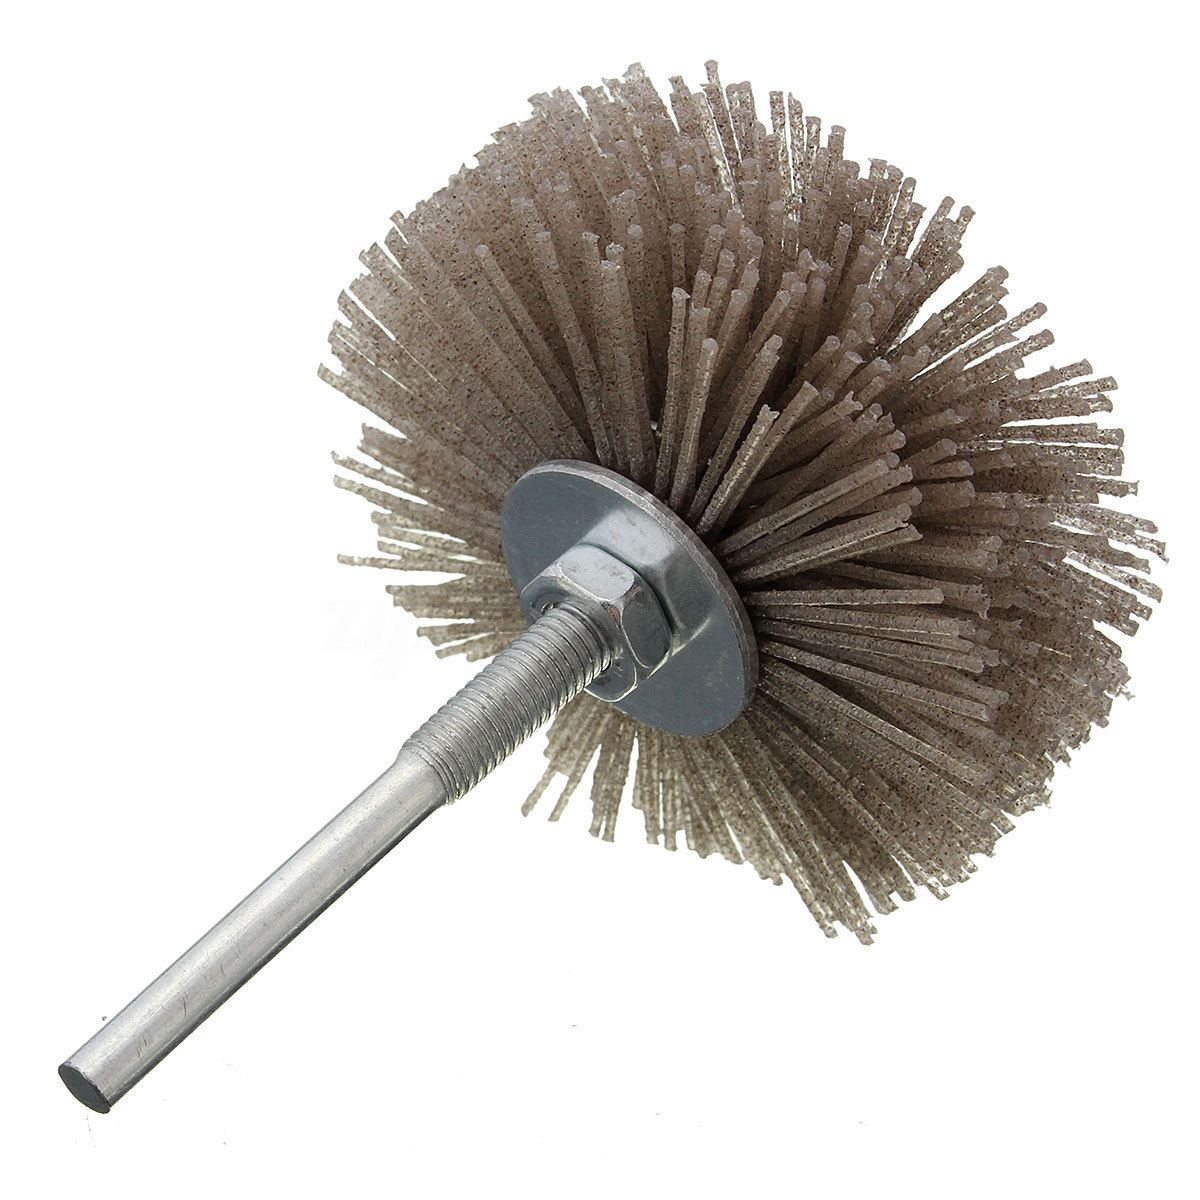 2Pcs 80mm Abrasive Nylon Wheel Brush Grit 120 Woodwork Polishing Grinder